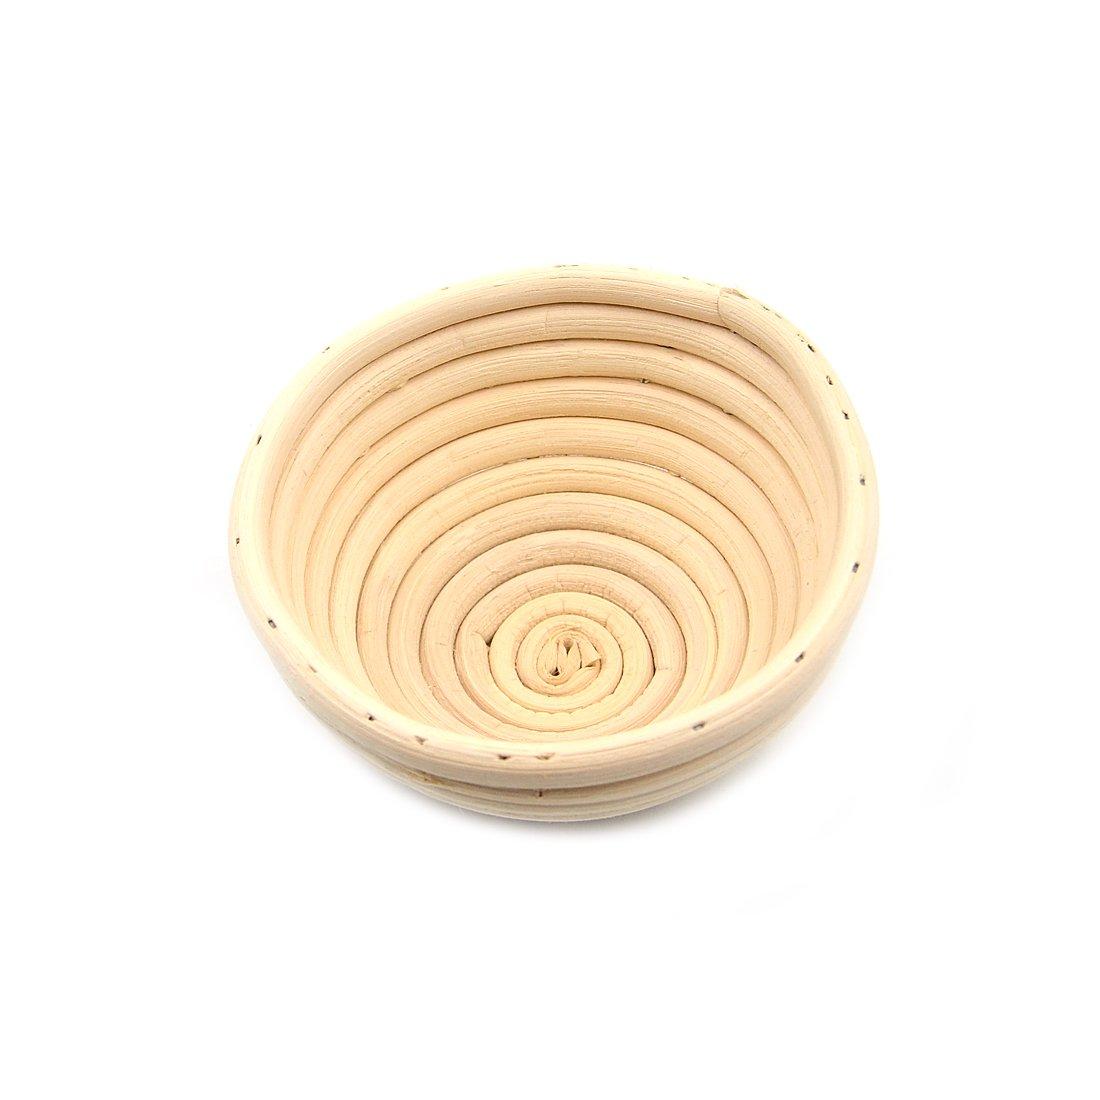 AngelaKerry 1pcs 13x6cm (5'' Diameter) Banneton Brotform Round Bread Proofing Basket Handmade